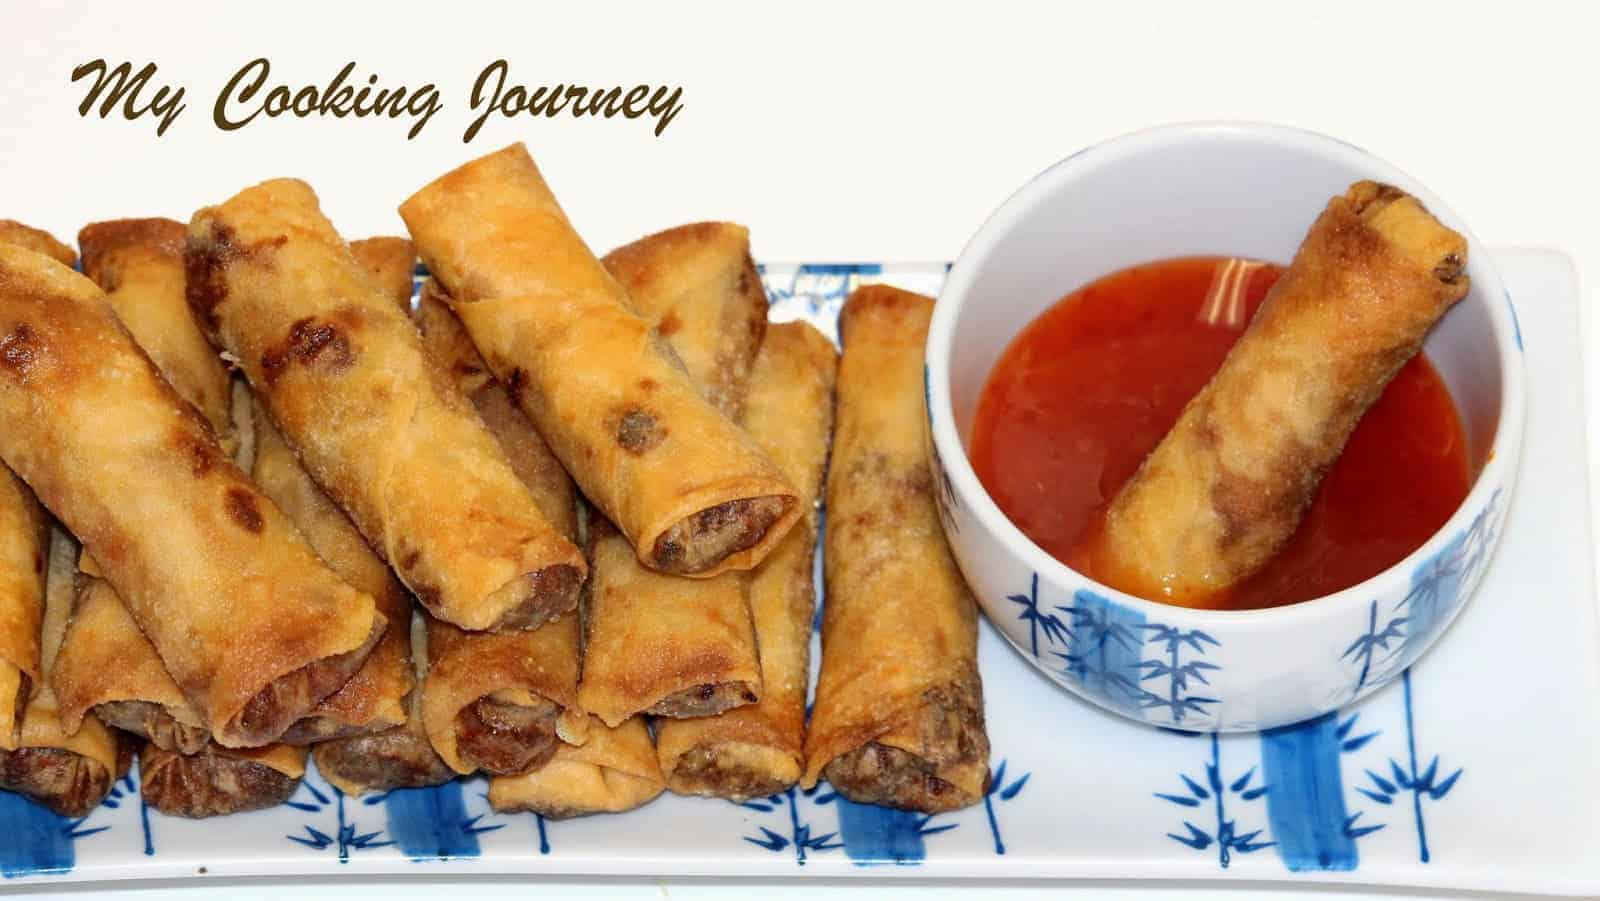 Spring Rolls – Vegetable and Tofu Spring Rolls